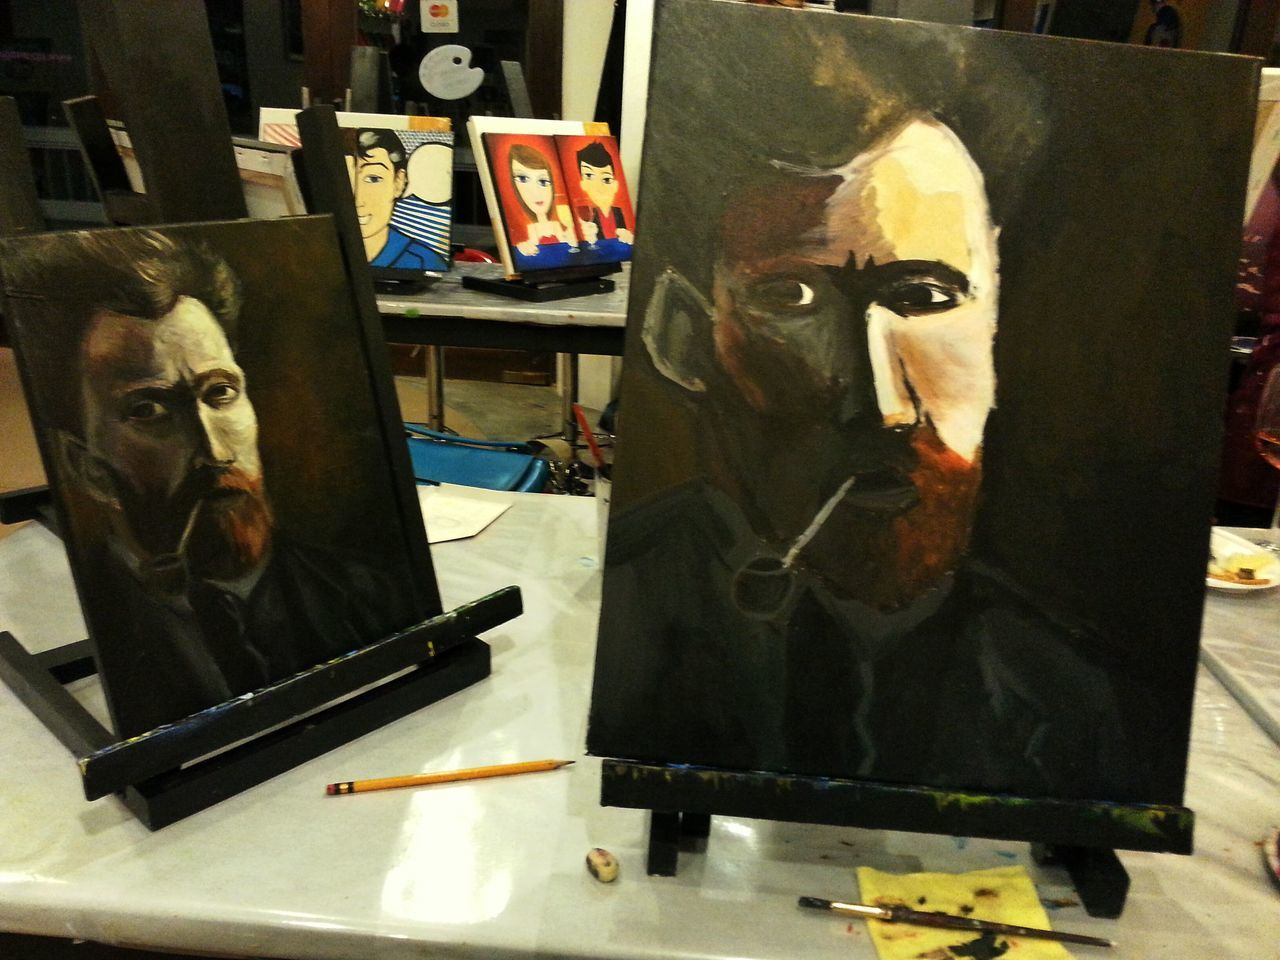 My first painting. Van Gogh. #amatuer #canvass #Dark #horizon #interests #oil #oilpainting #portrait #vangogh